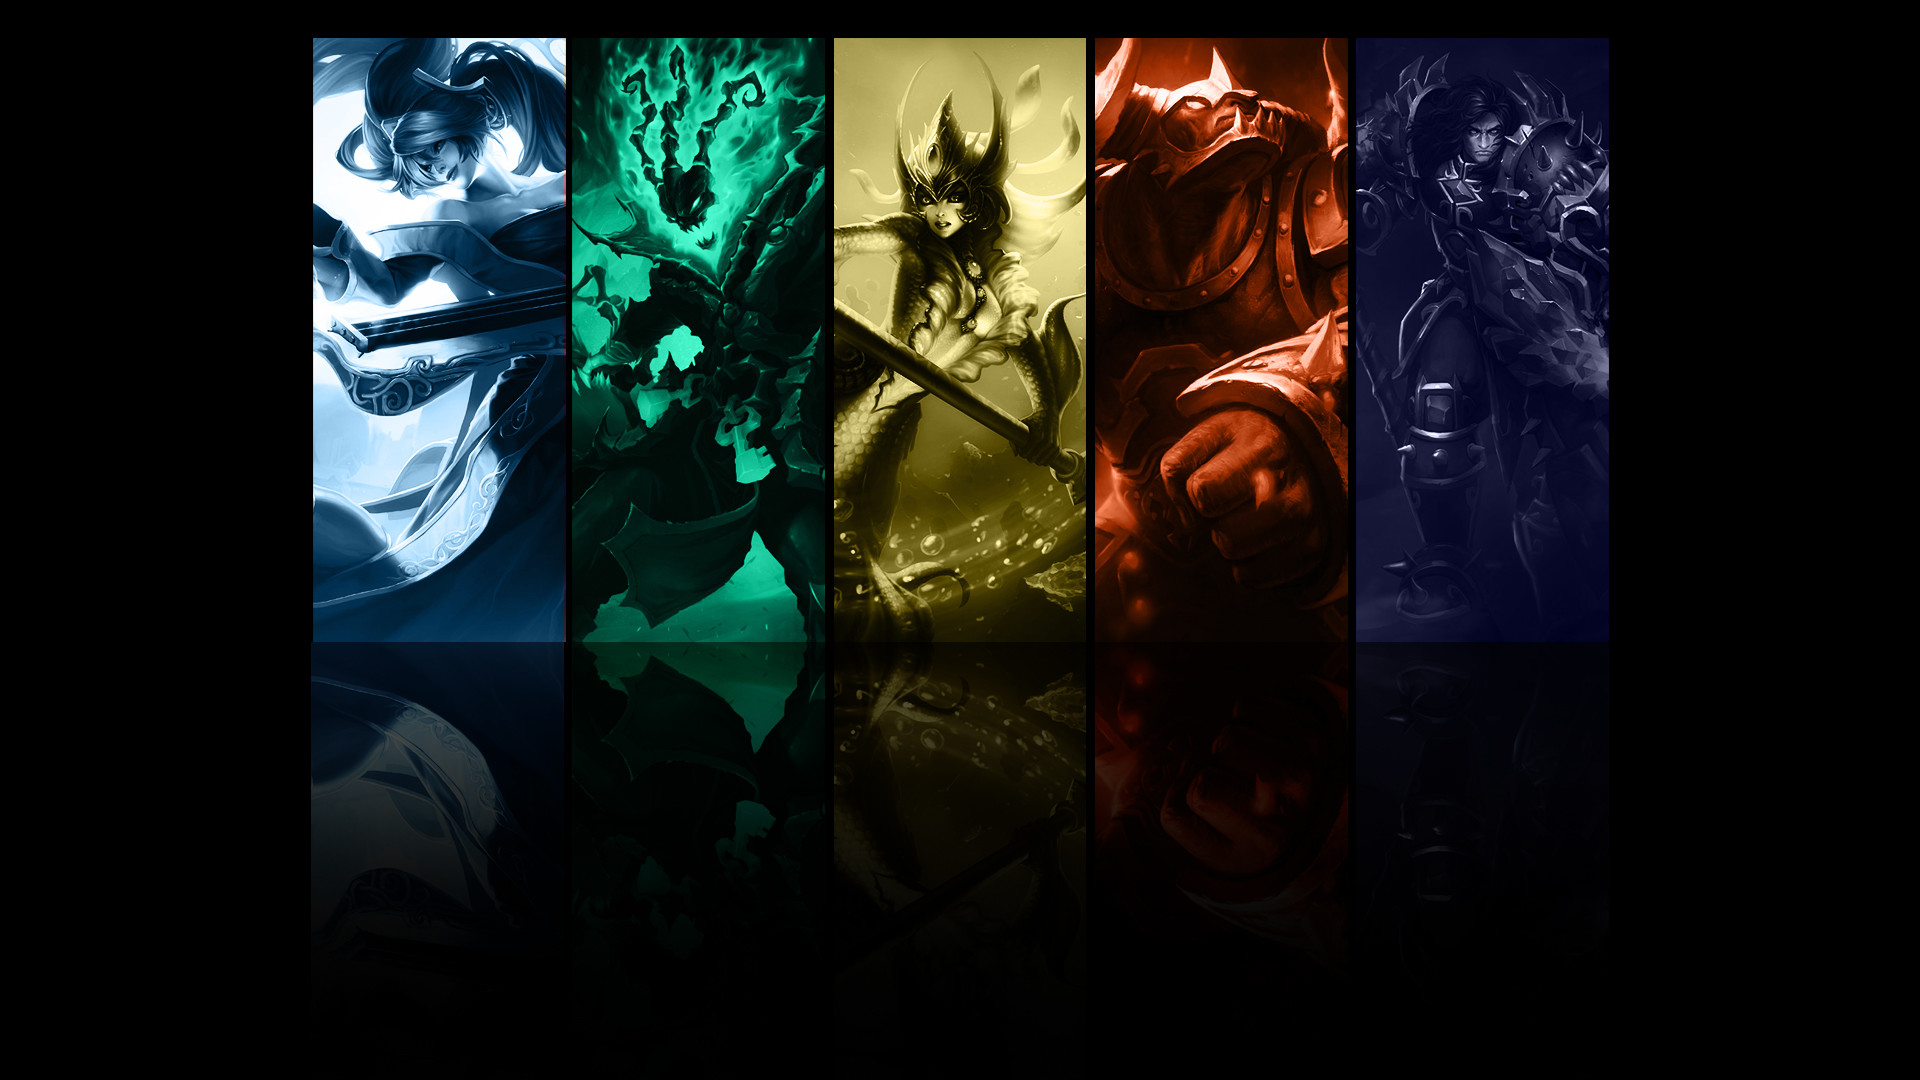 … league of legends support league of legends support wallpaper …